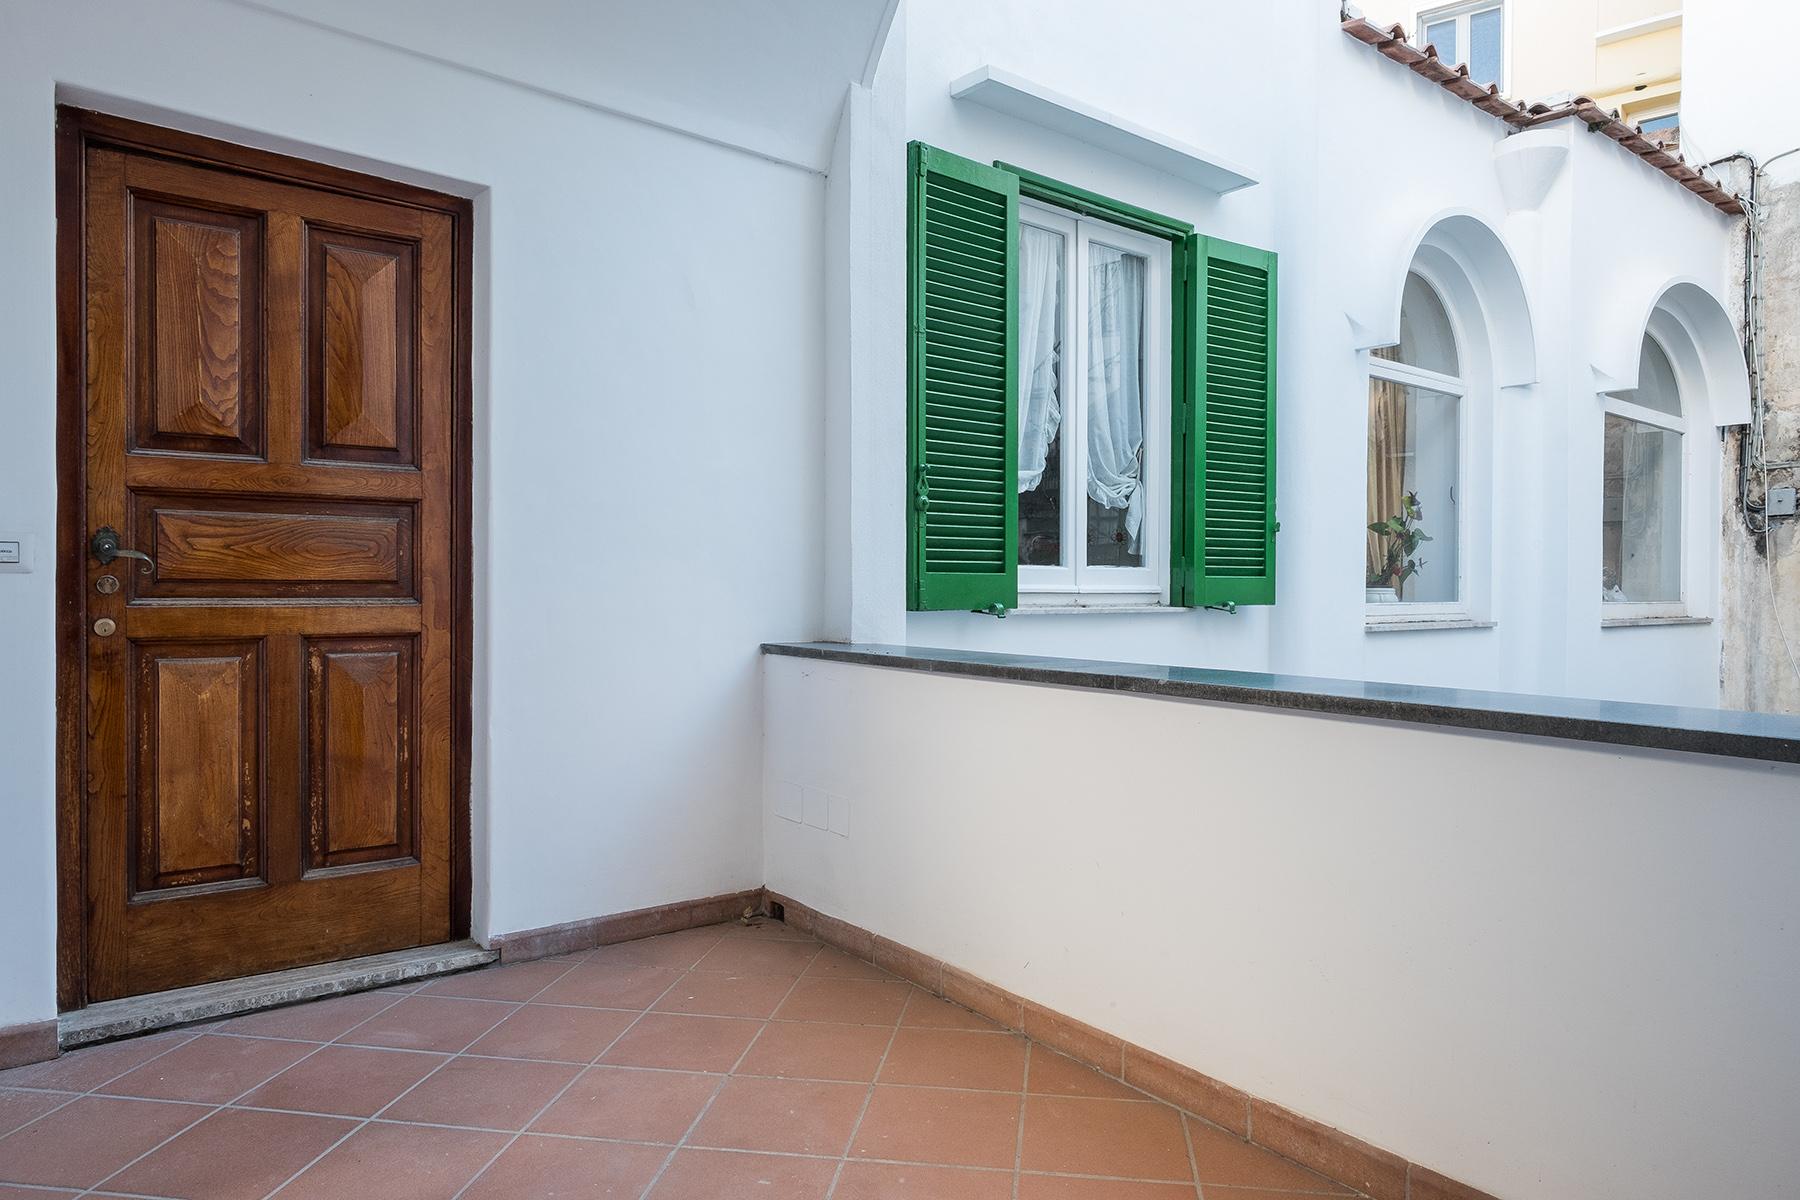 Casa indipendente in Vendita a Capri: 5 locali, 400 mq - Foto 22